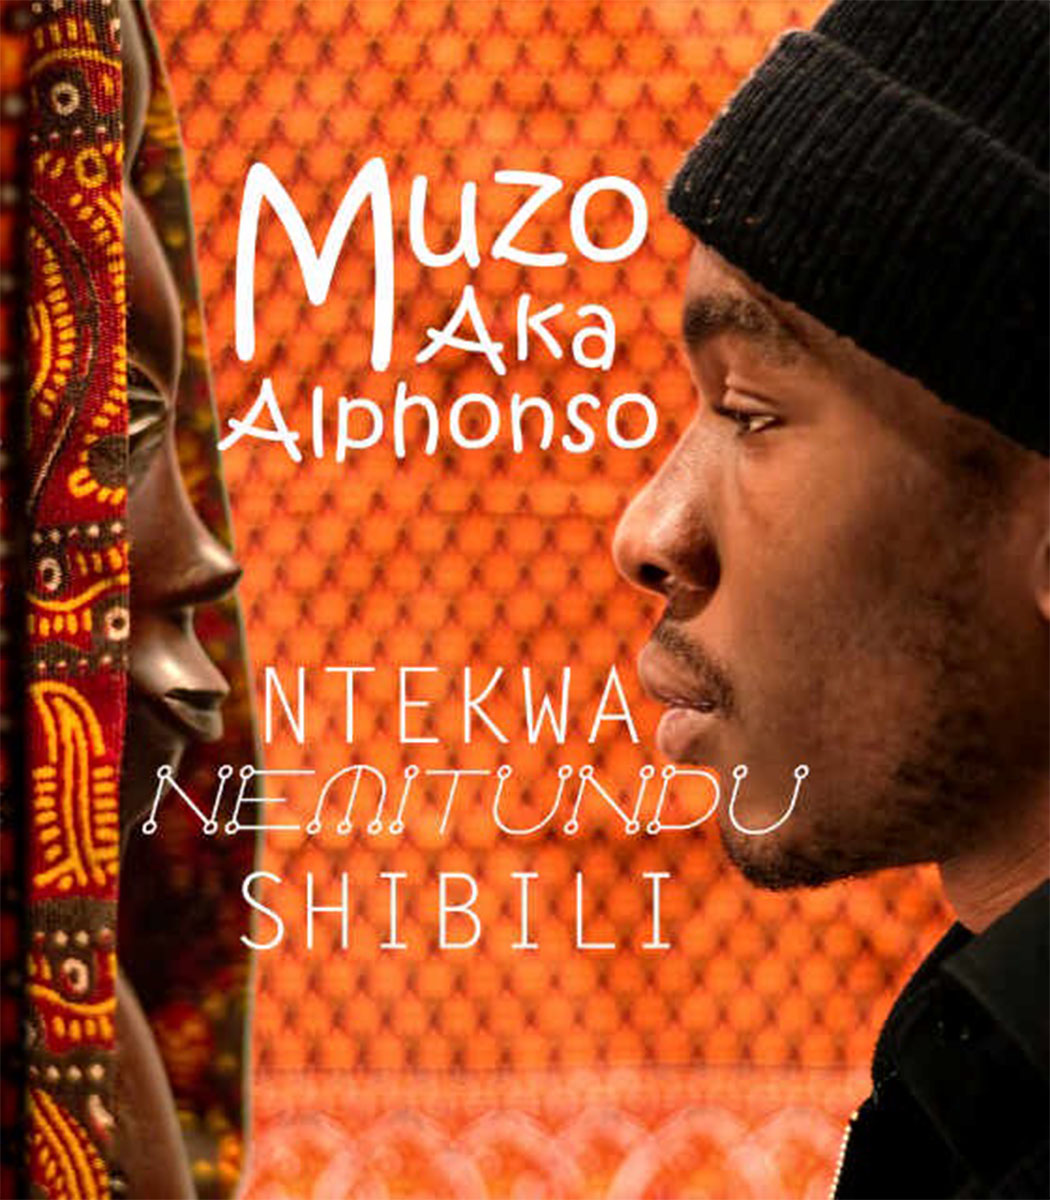 Kopala Swag statement on Muzo's album 'Ntekwa Nemitundu Shibili'